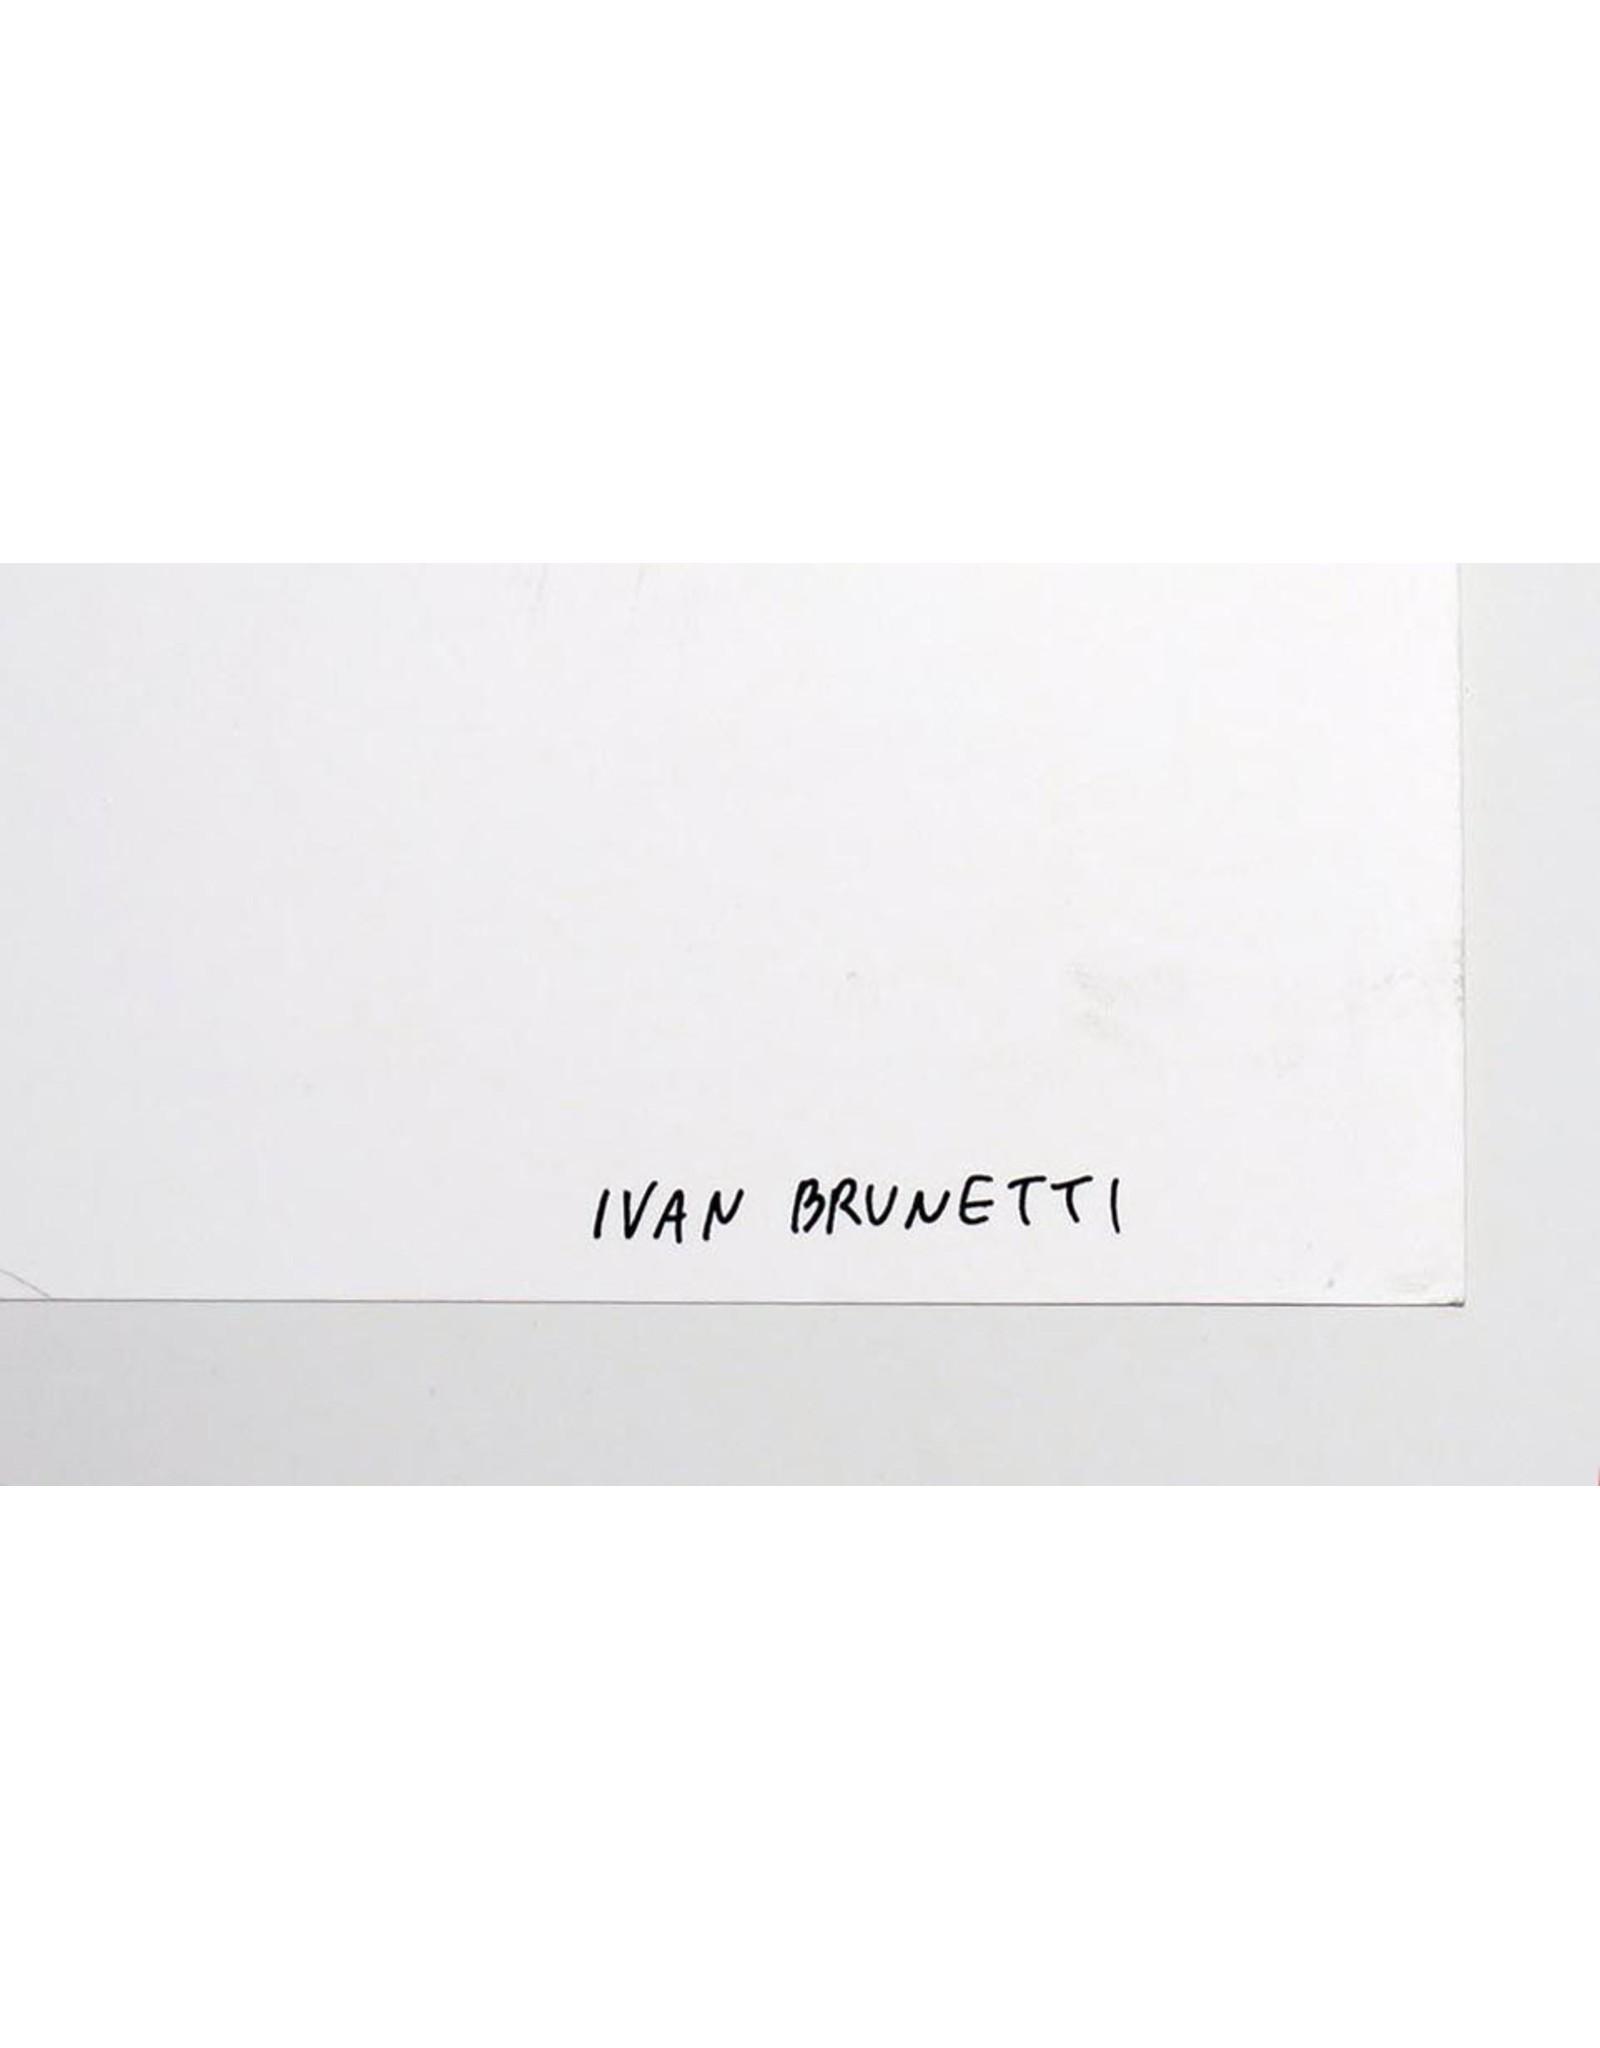 Ivan Brunetti Moonlight (from Wordplay) 2016 by Ivan Brunetti